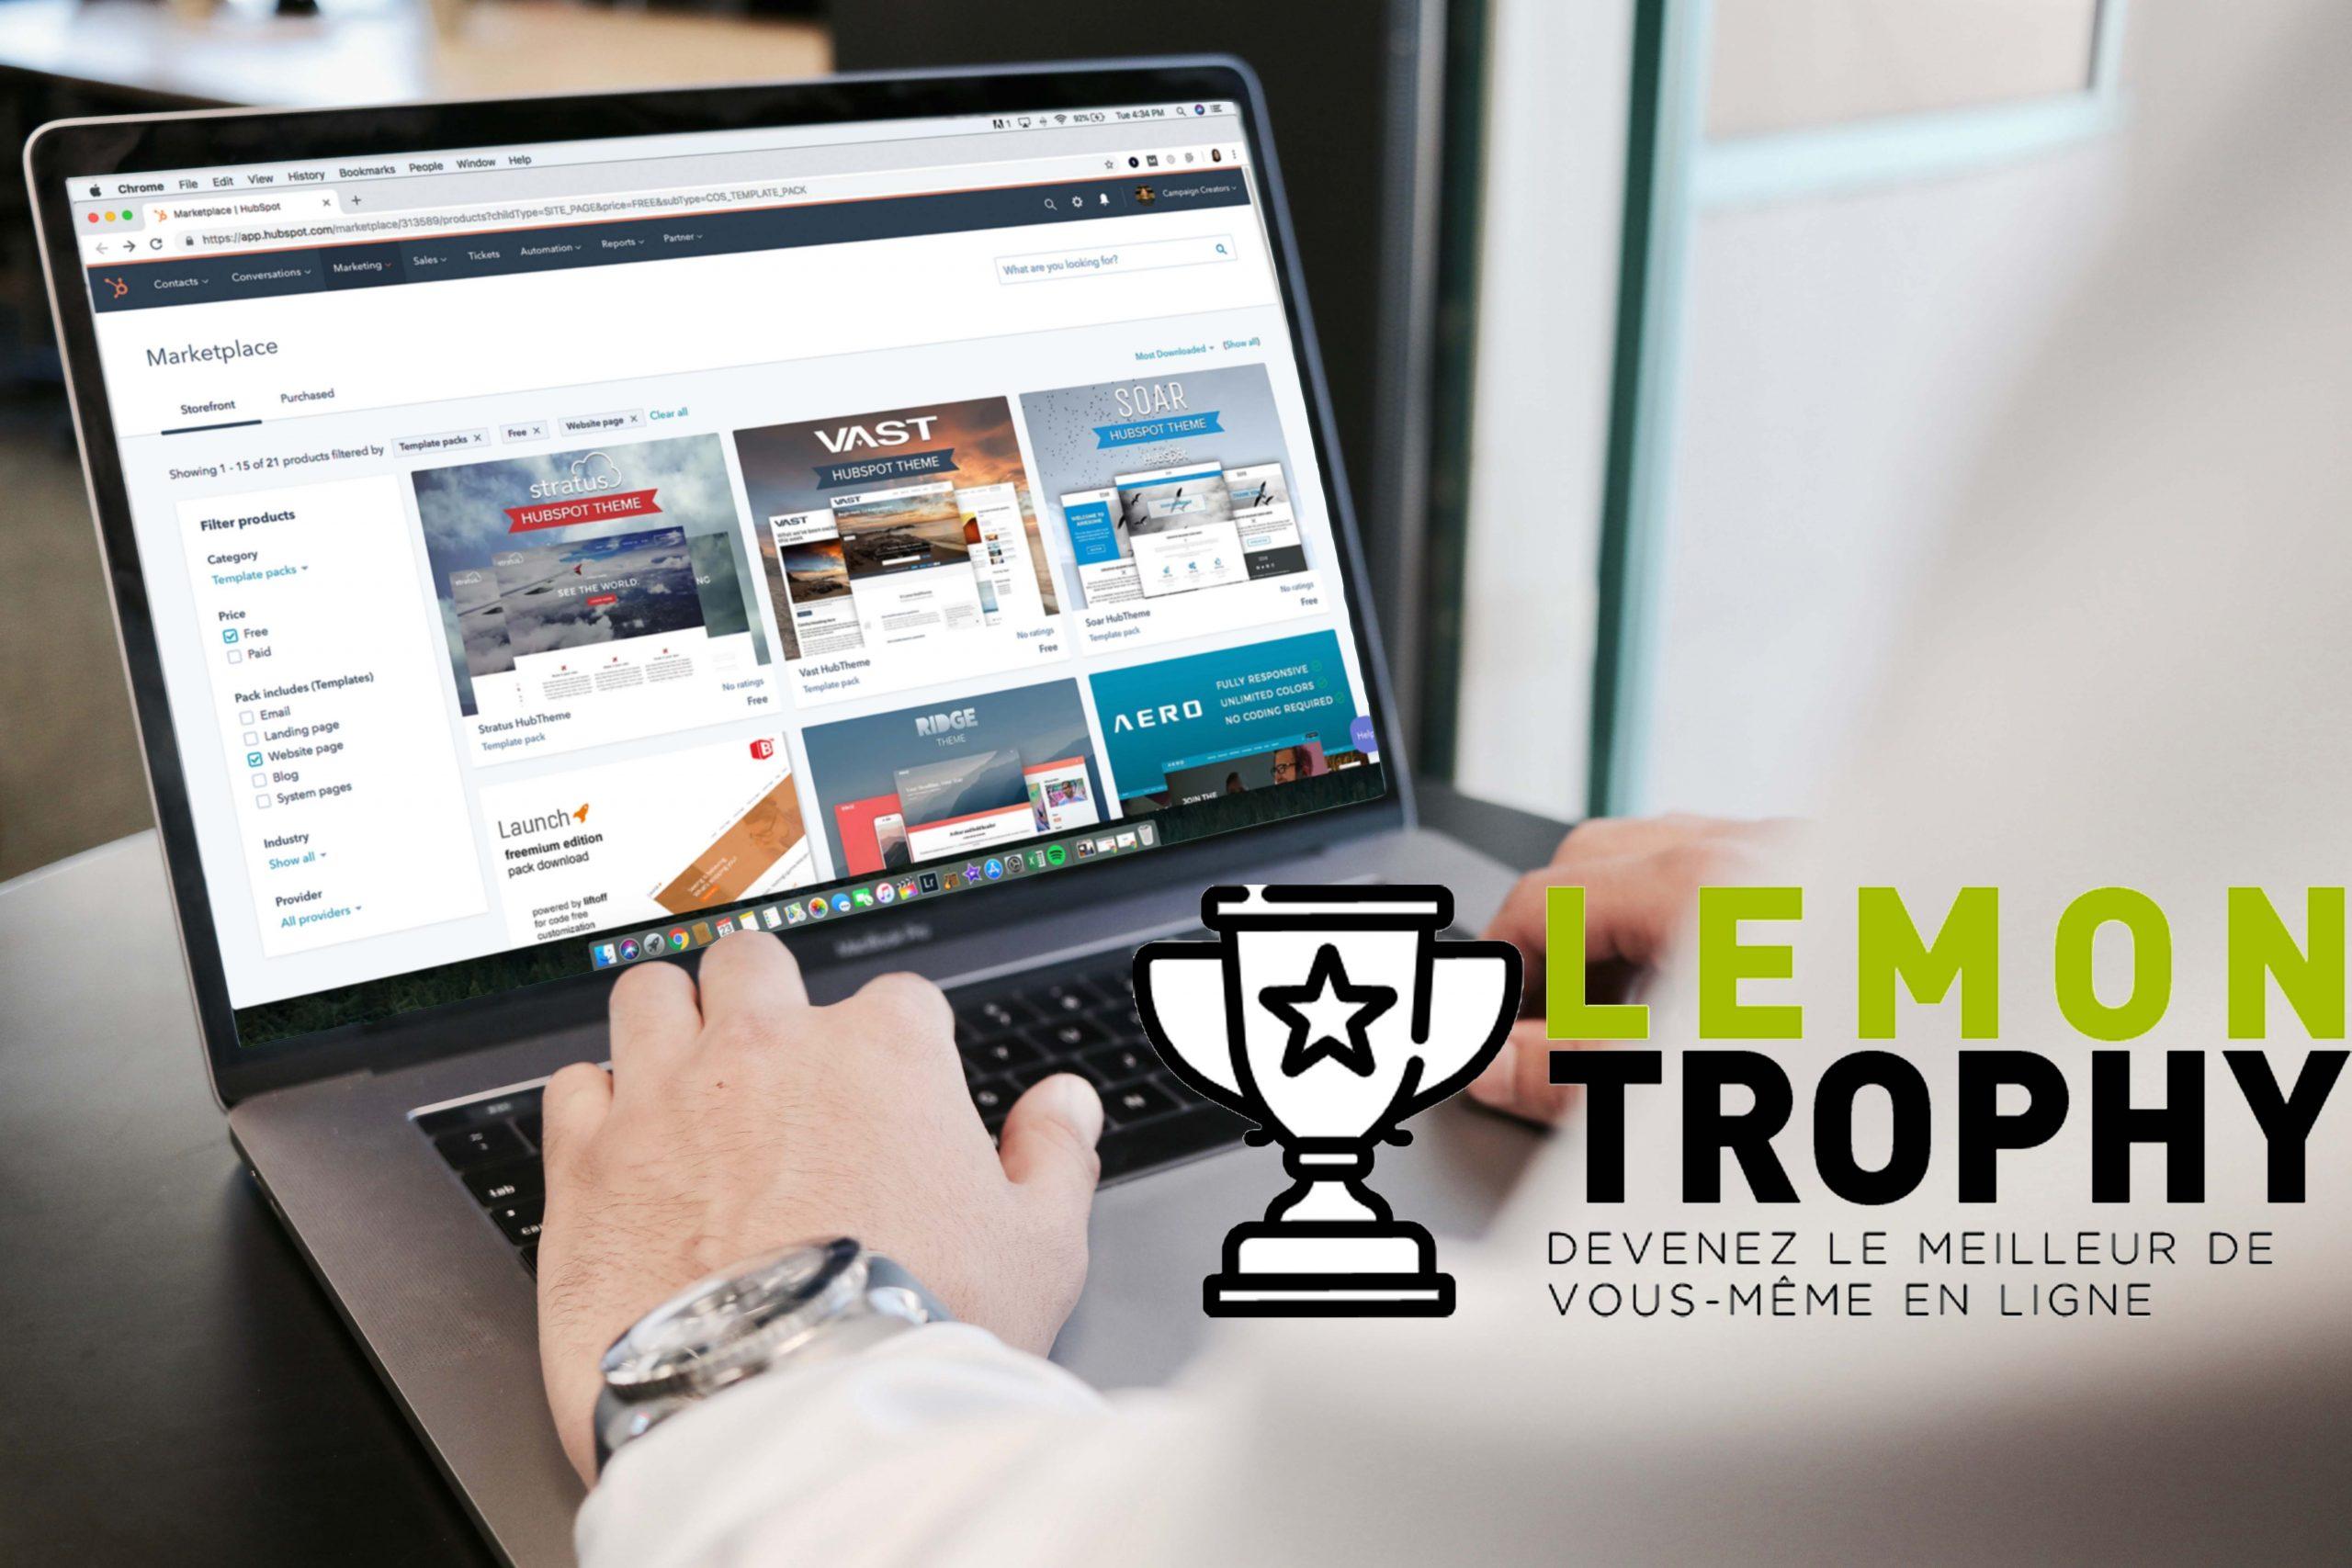 Lemon Trophy: Strengthen your startup's online presence